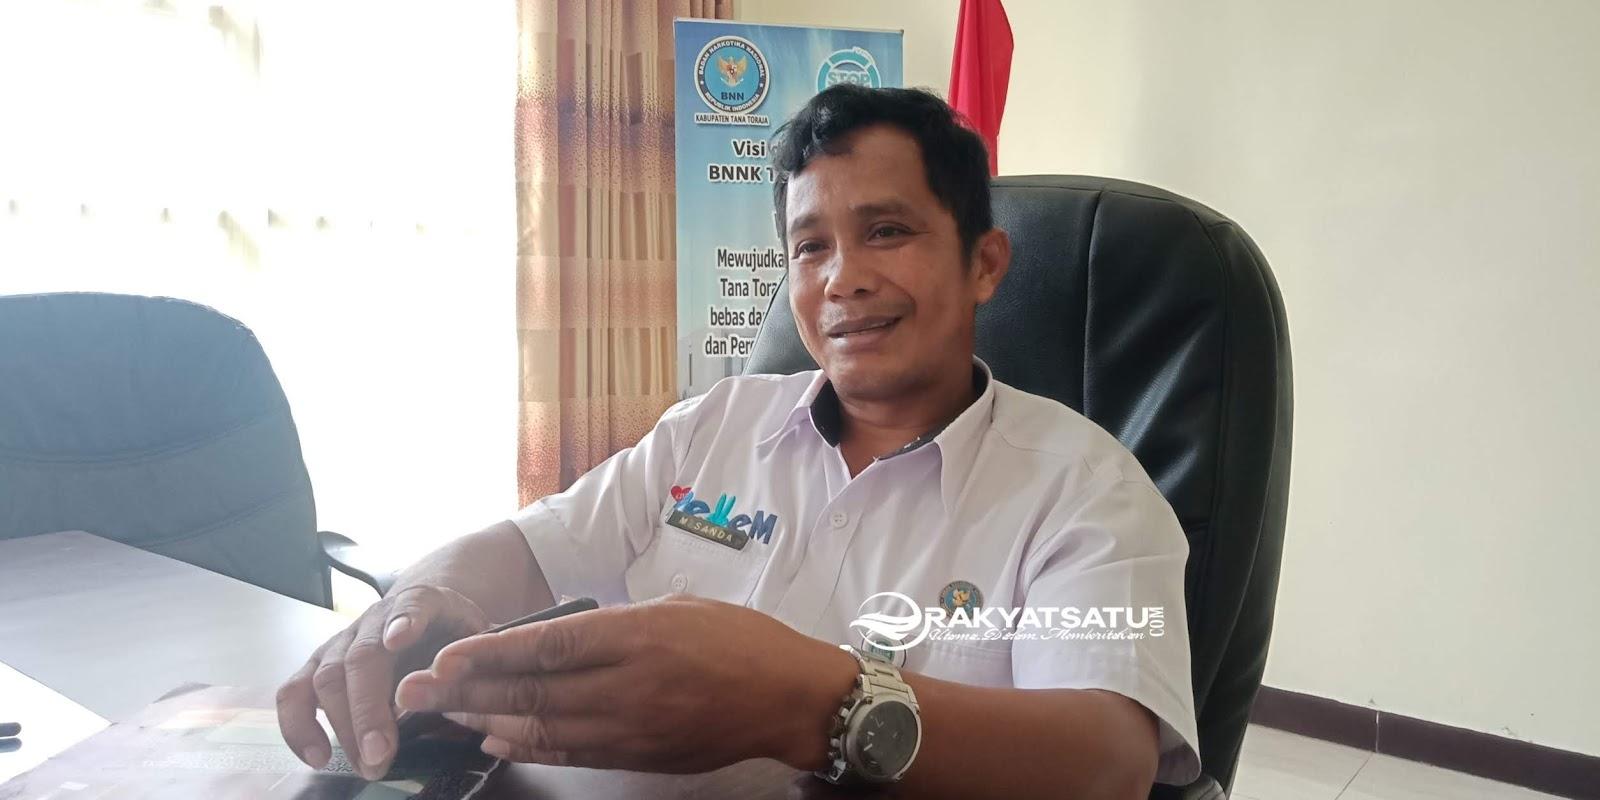 Lembang Tonglo Terpilih Jadi Pencanangan Lembang Bersih Narkoba